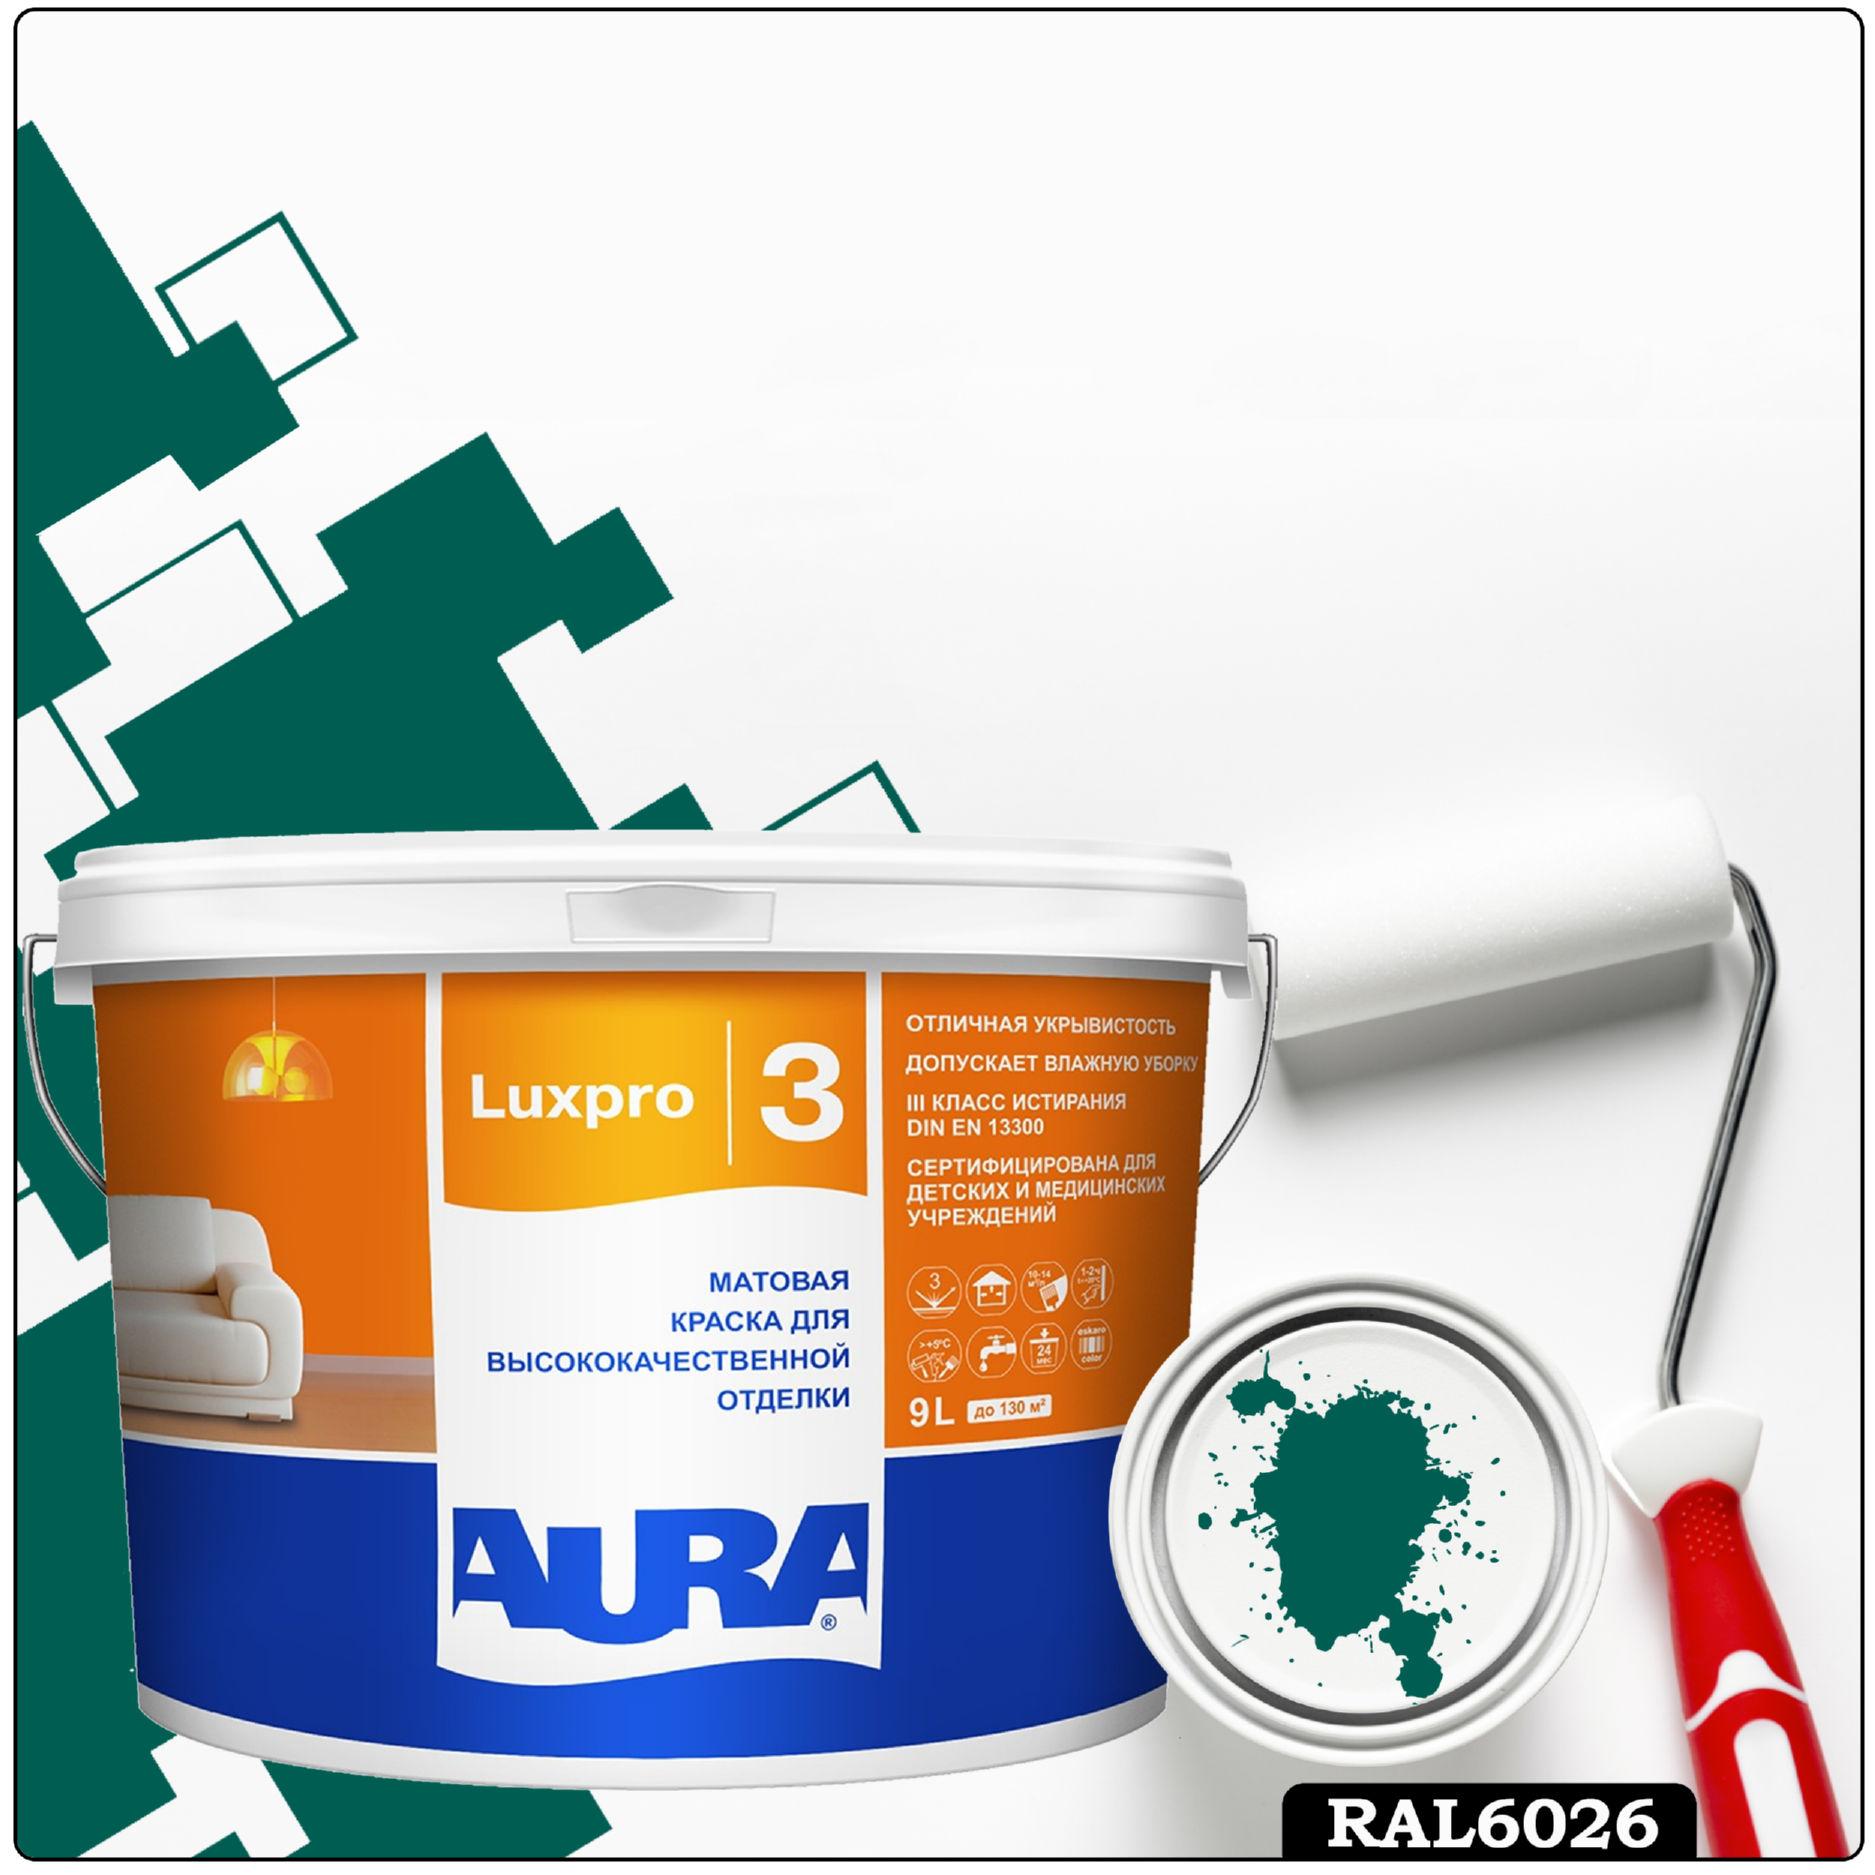 Фото 2 - Краска Aura LuxPRO 3, RAL 6026 Зеленый опал, латексная, шелково-матовая, интерьерная, 9л, Аура.